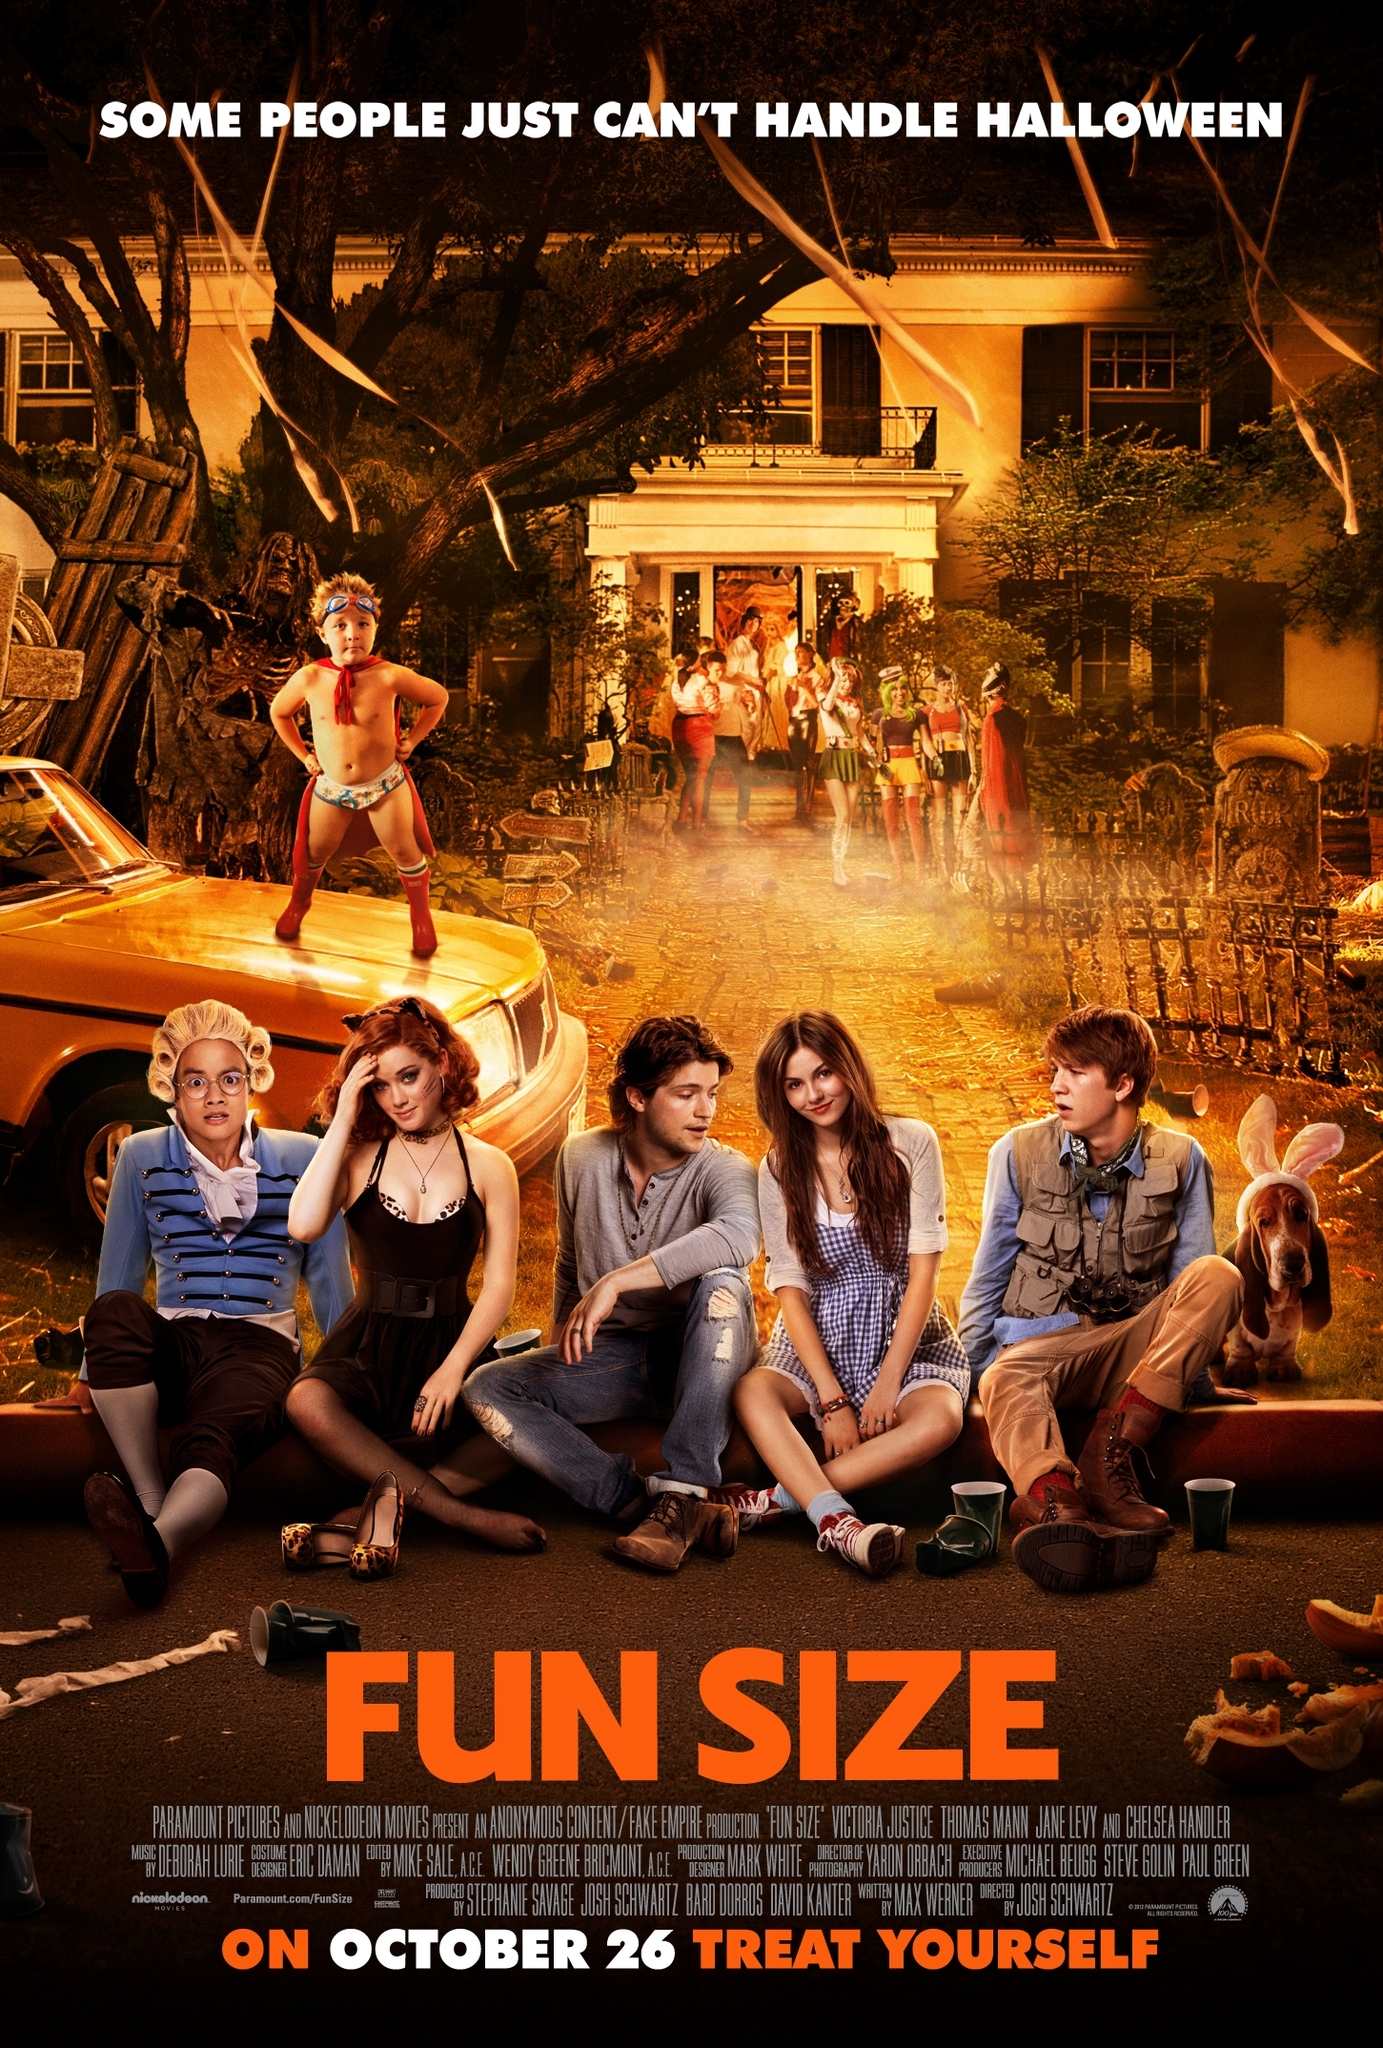 Fun Size Poster - HeyUGuys